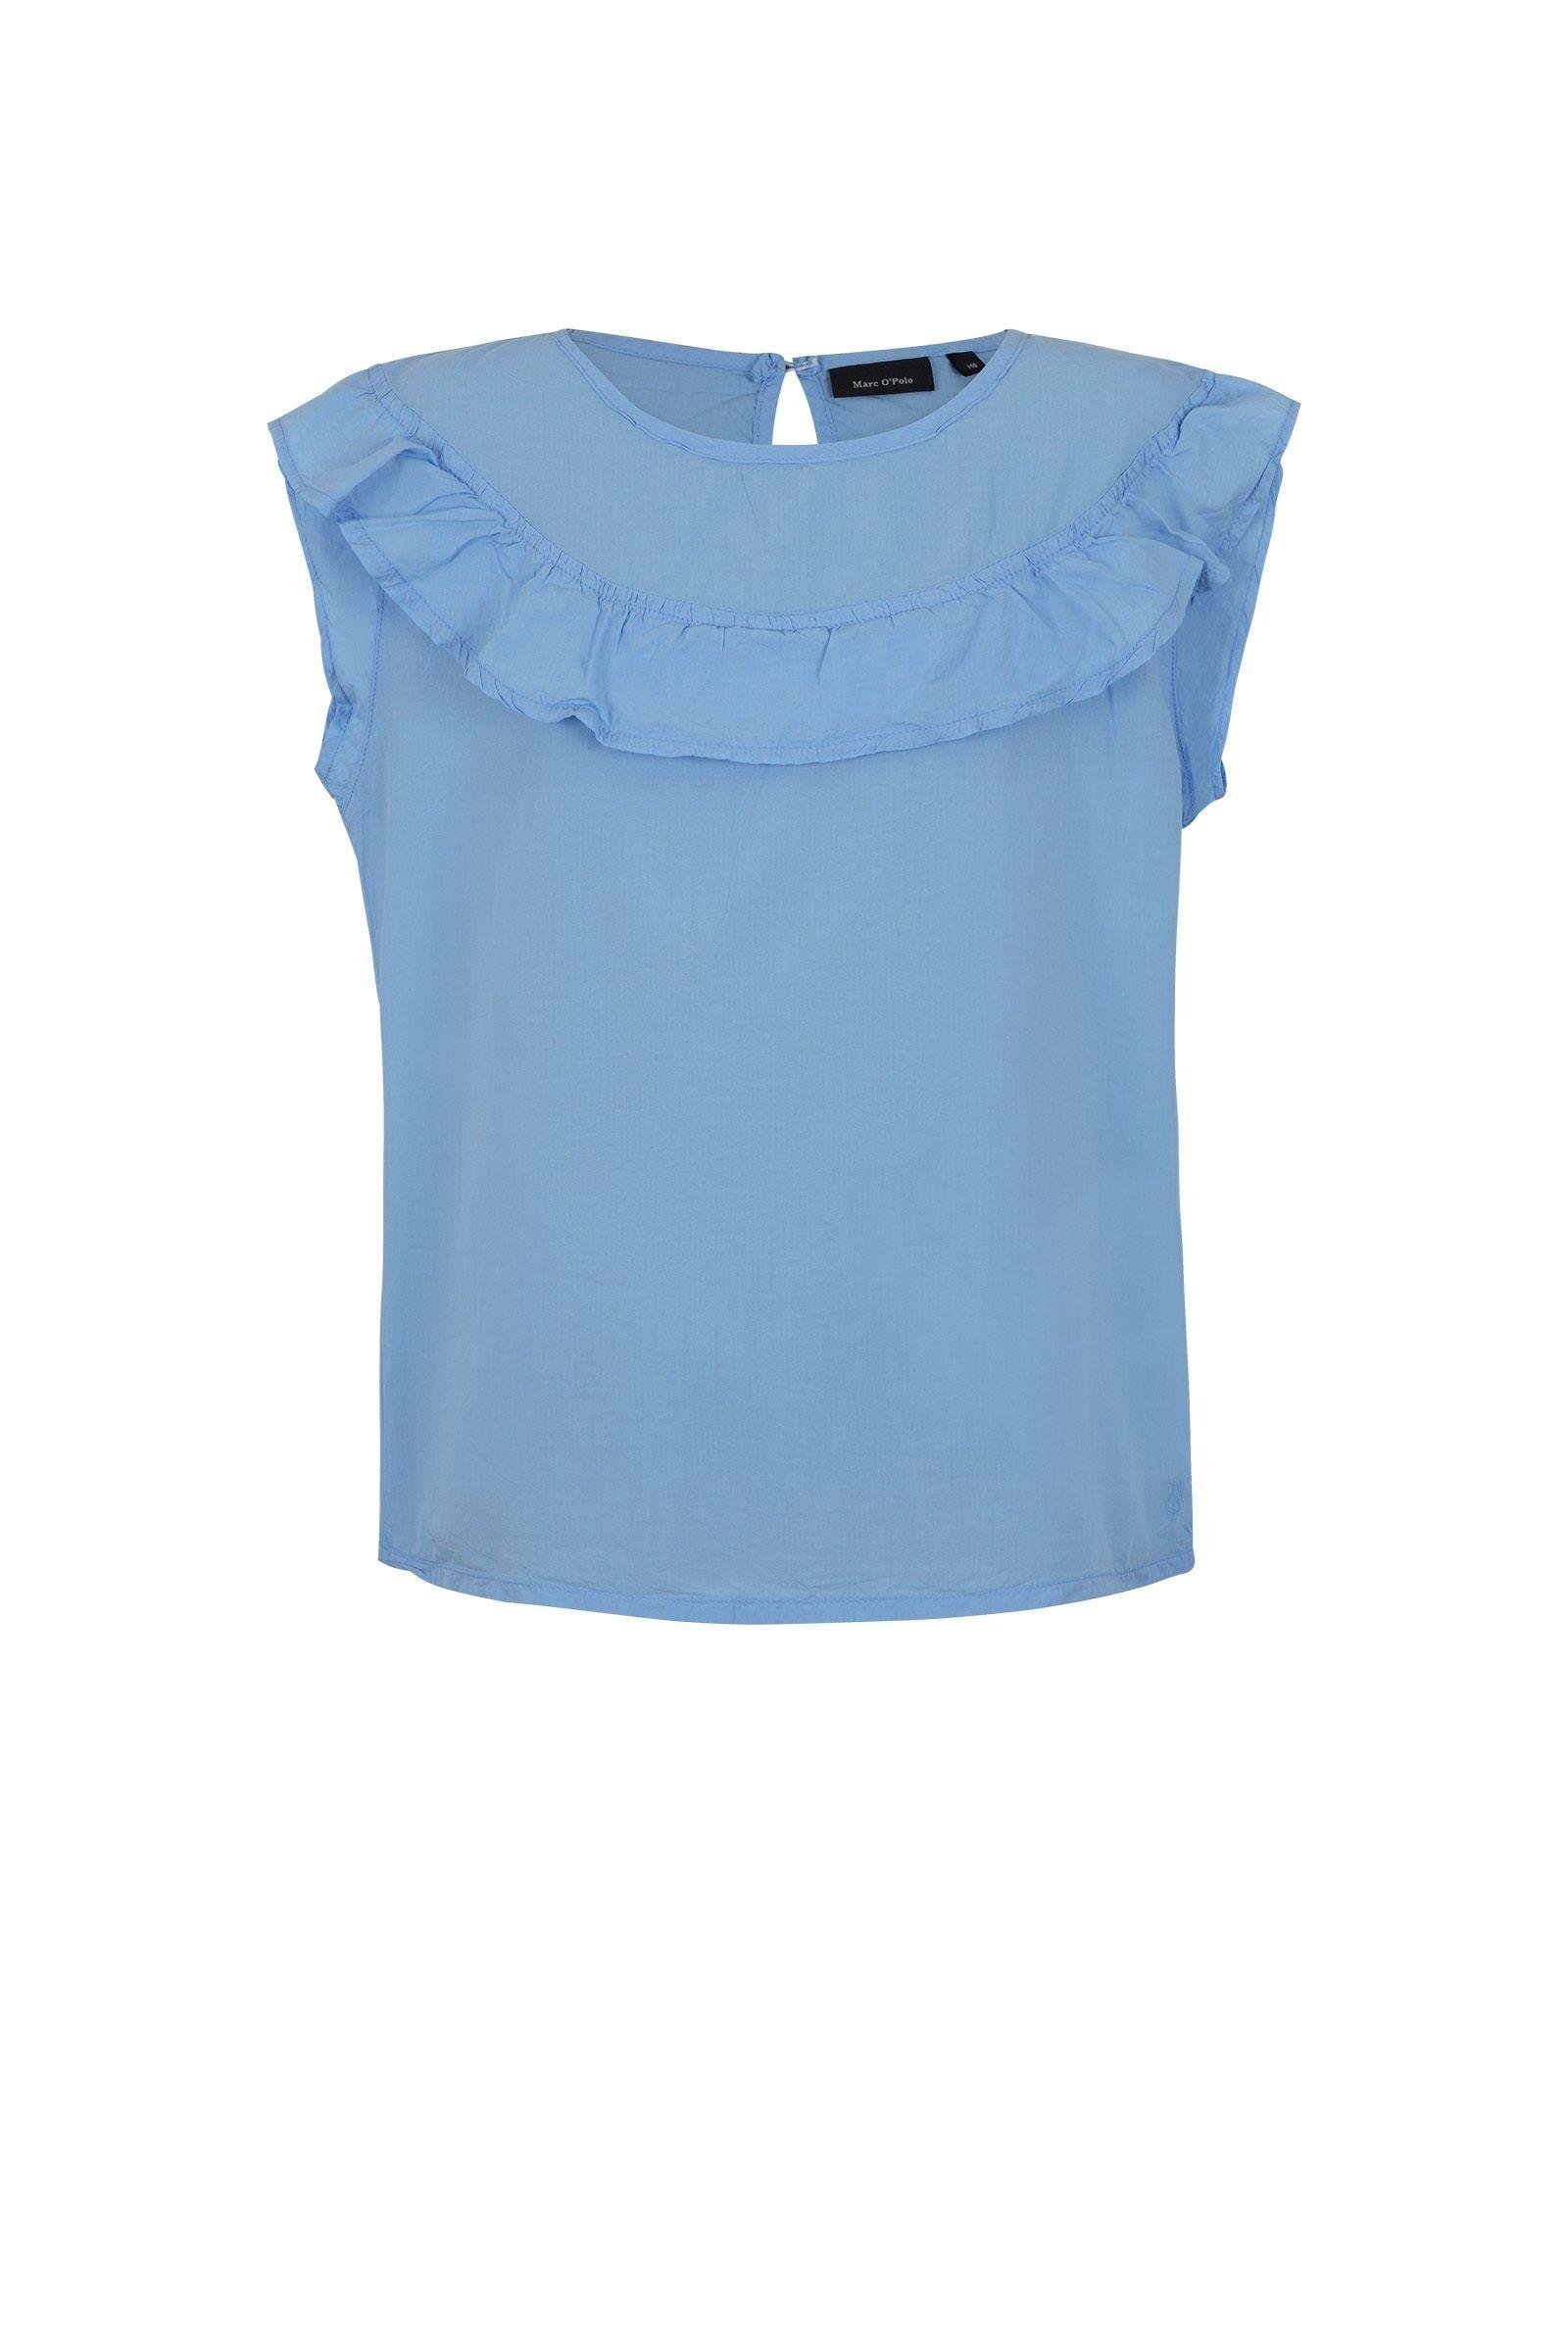 Marc O'Polo Junior Bluse blau Mädchen Blusen Mädchenkleidung